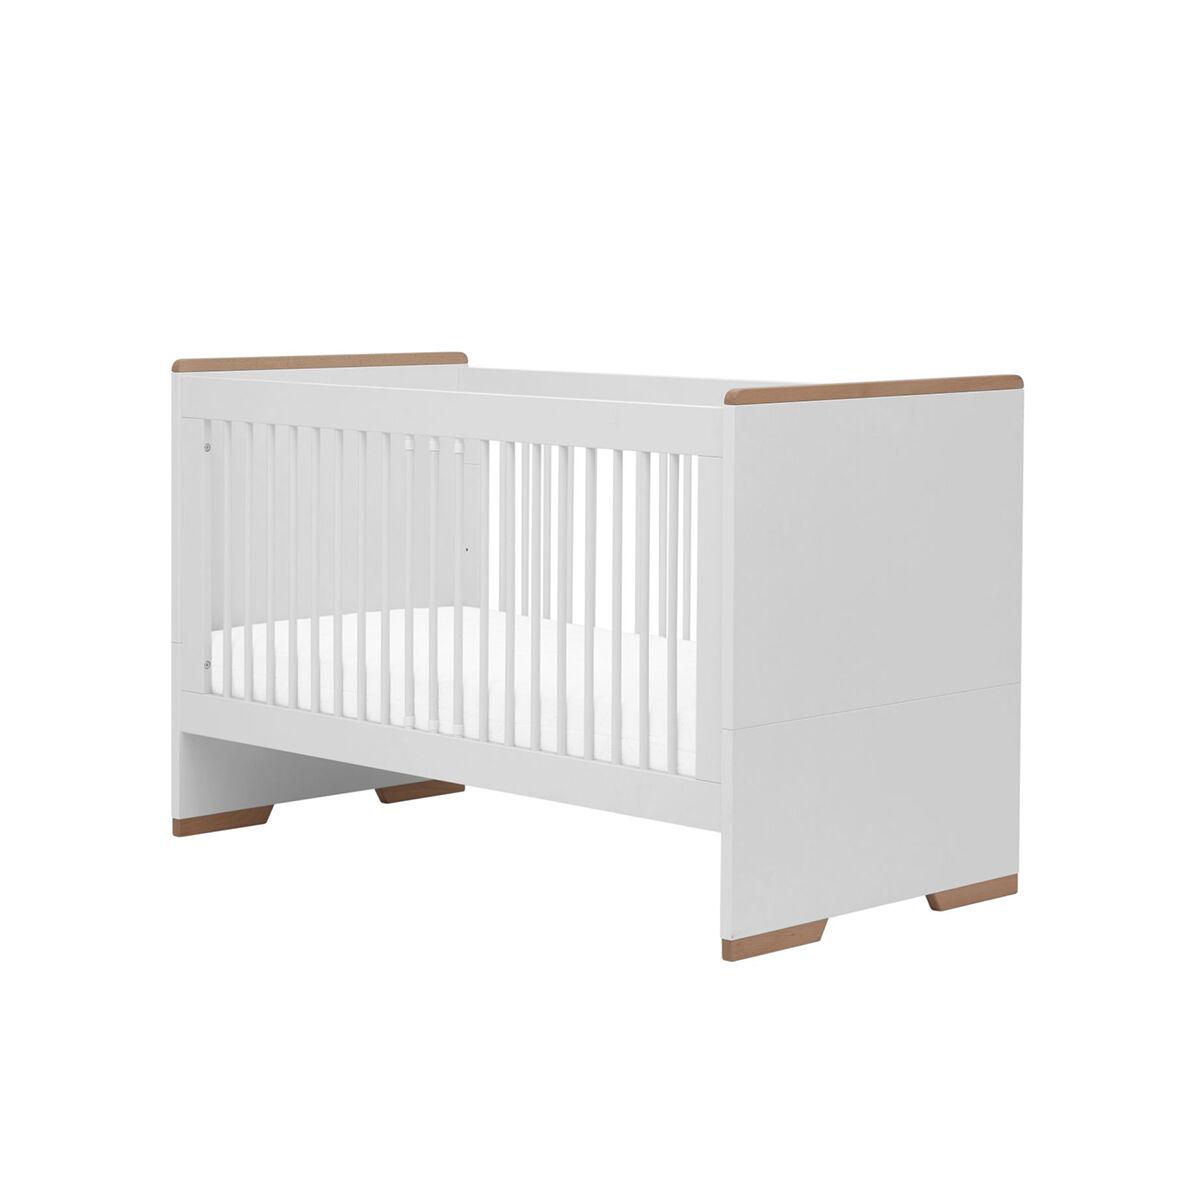 Pinio Lit évolutif 70x140 blanc bois